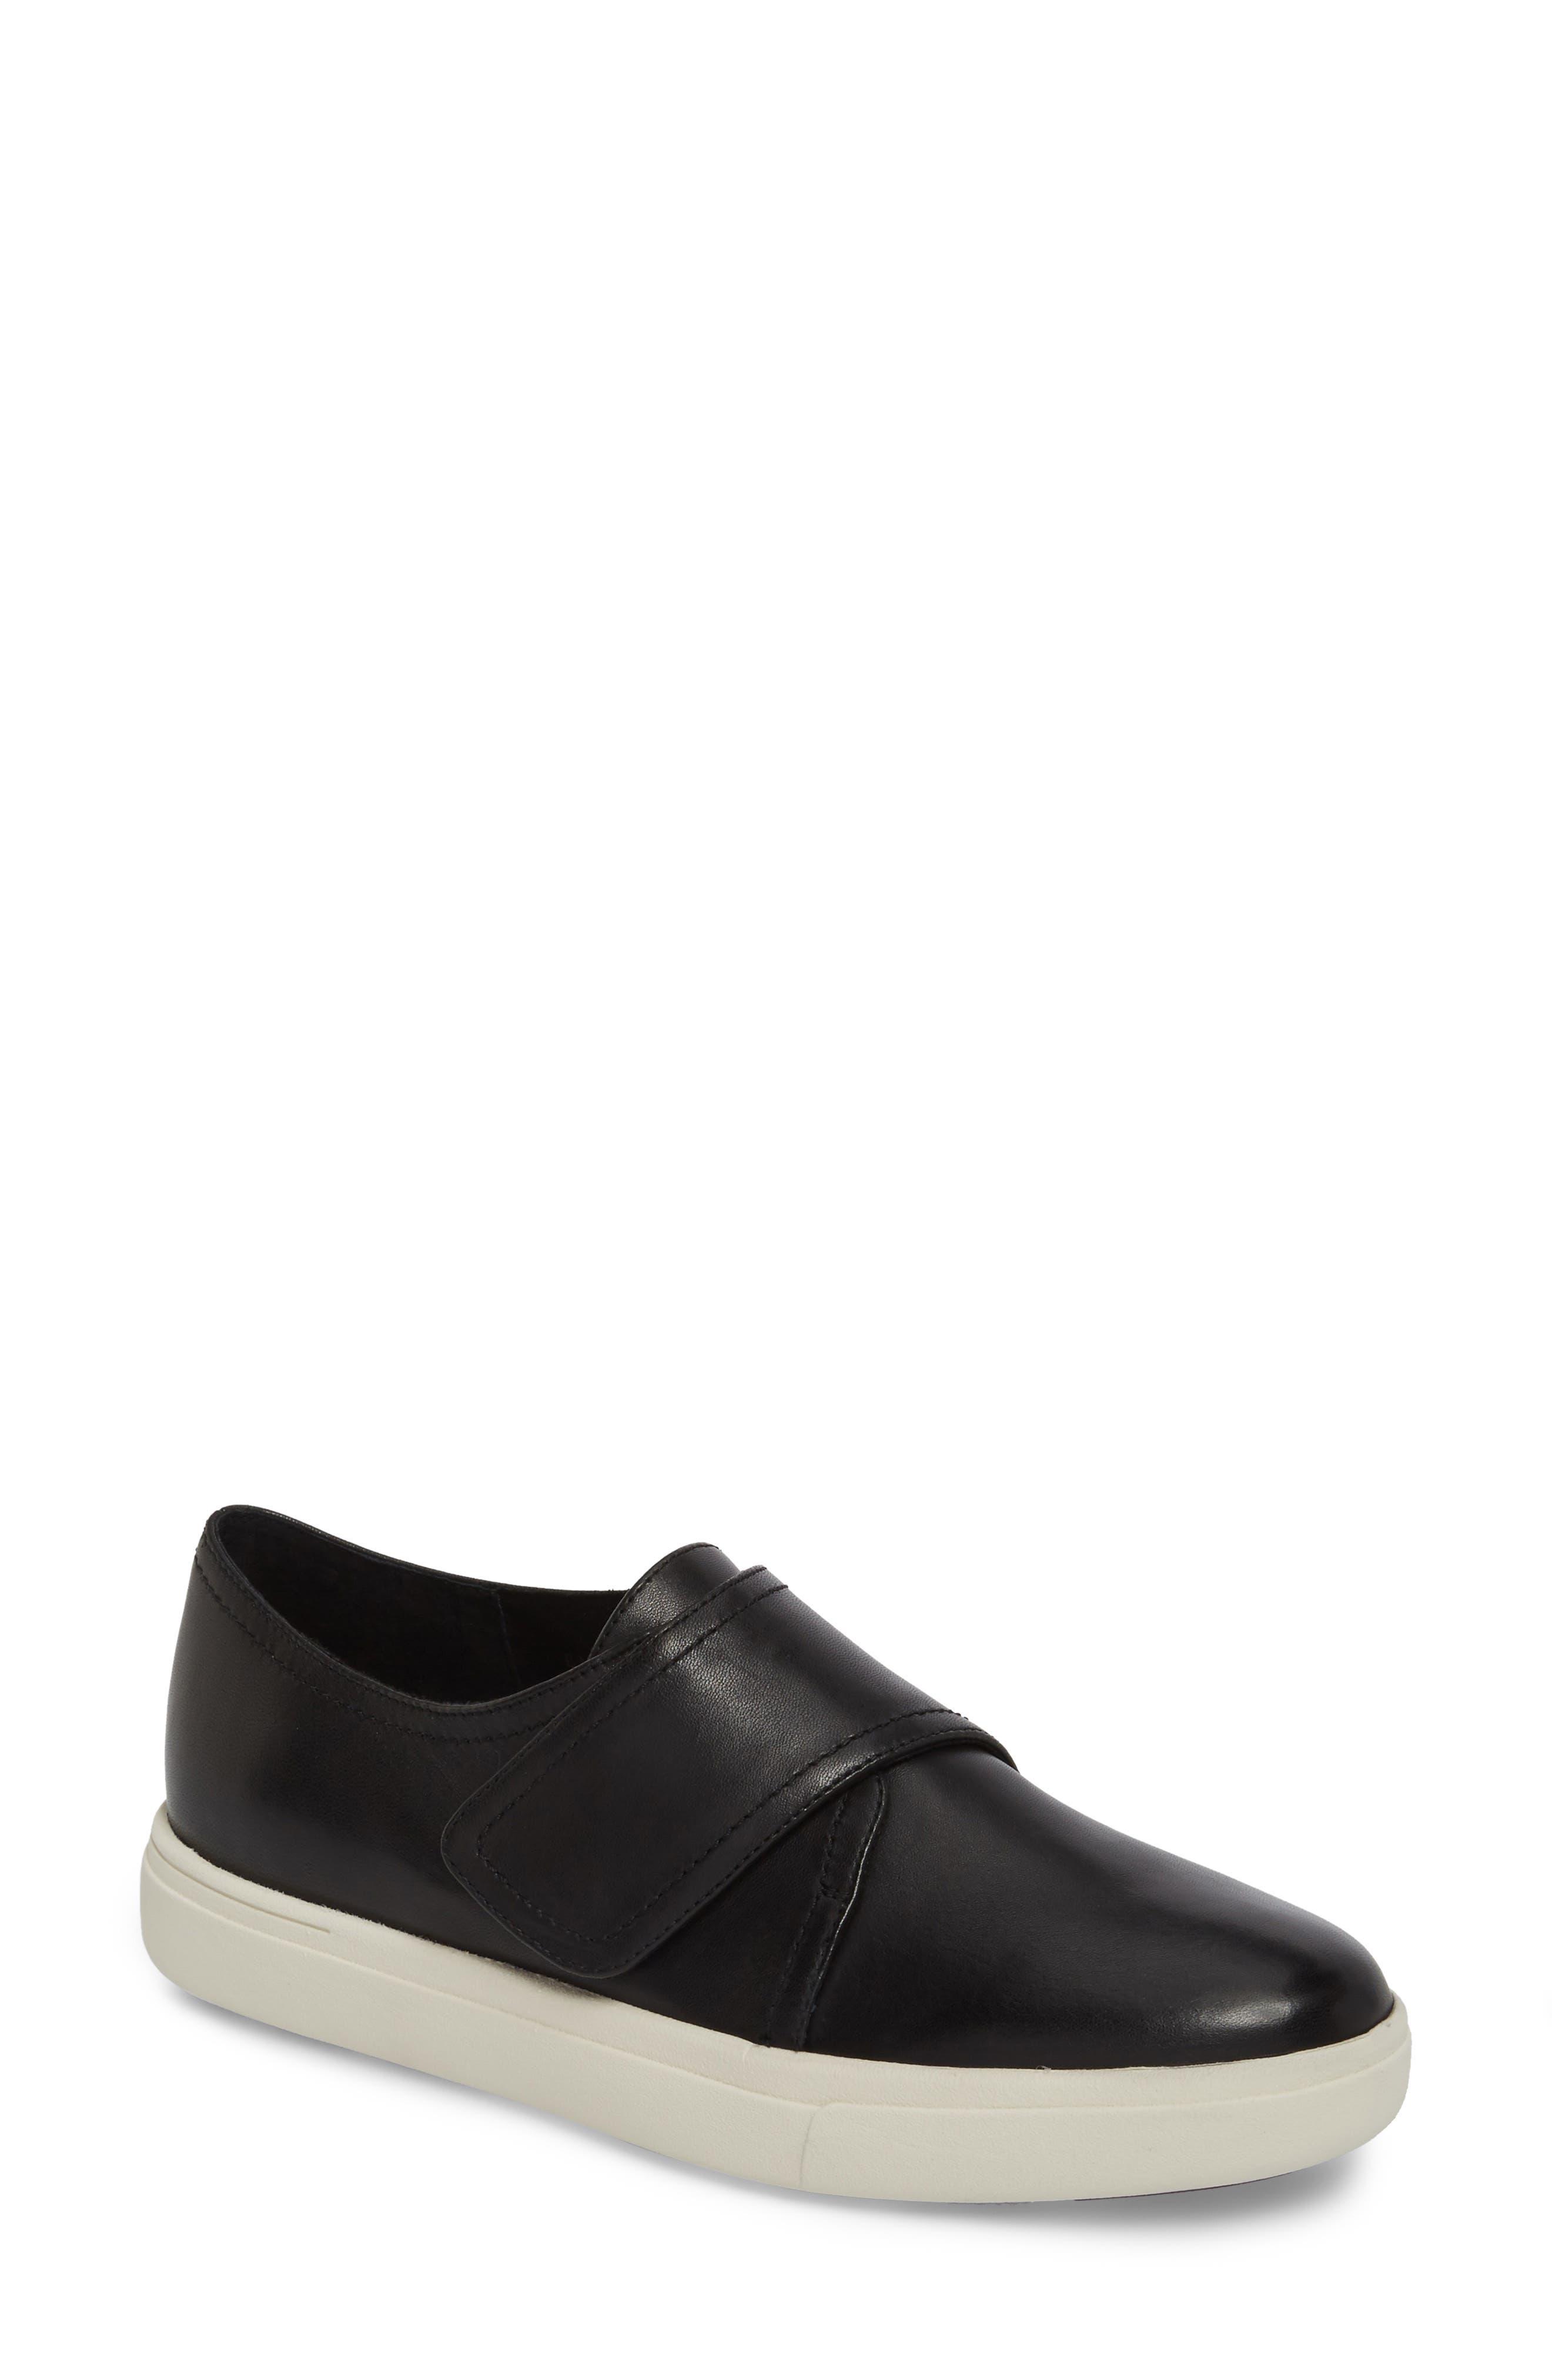 Oberon Slip-On Sneaker,                         Main,                         color, Black Leather